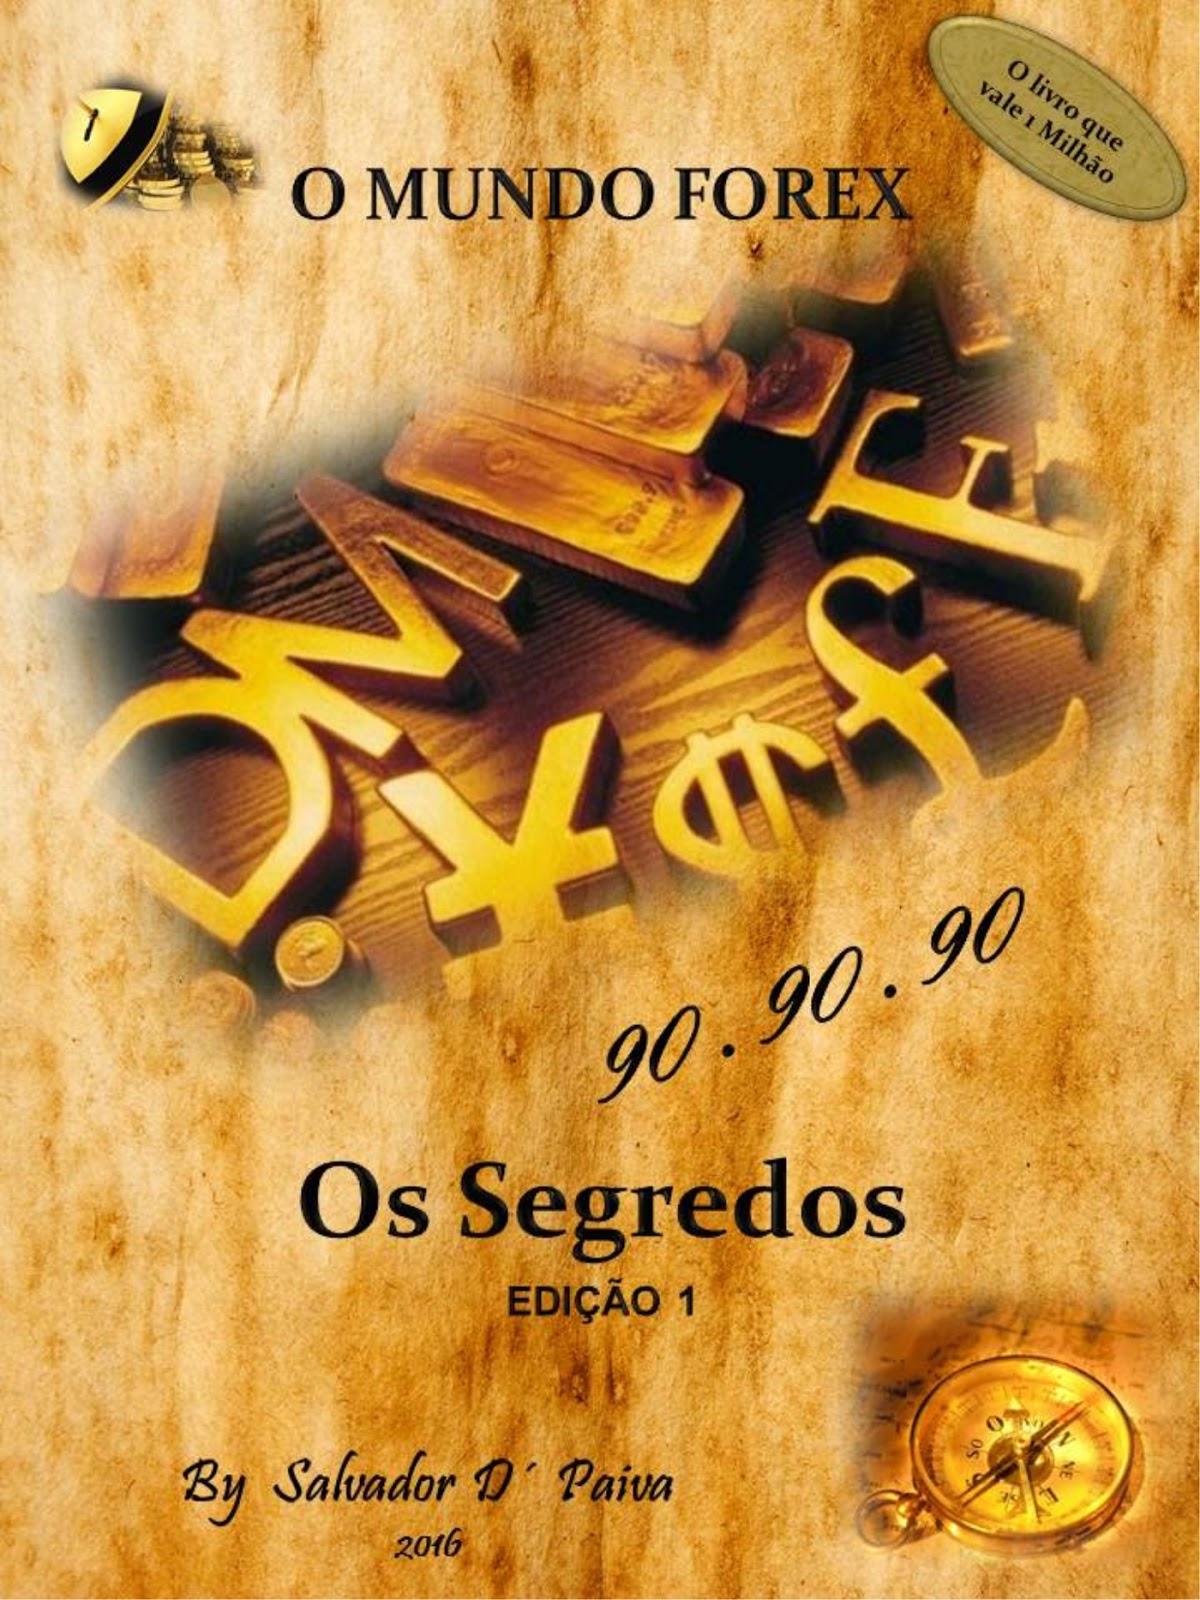 Corretora forex brasil